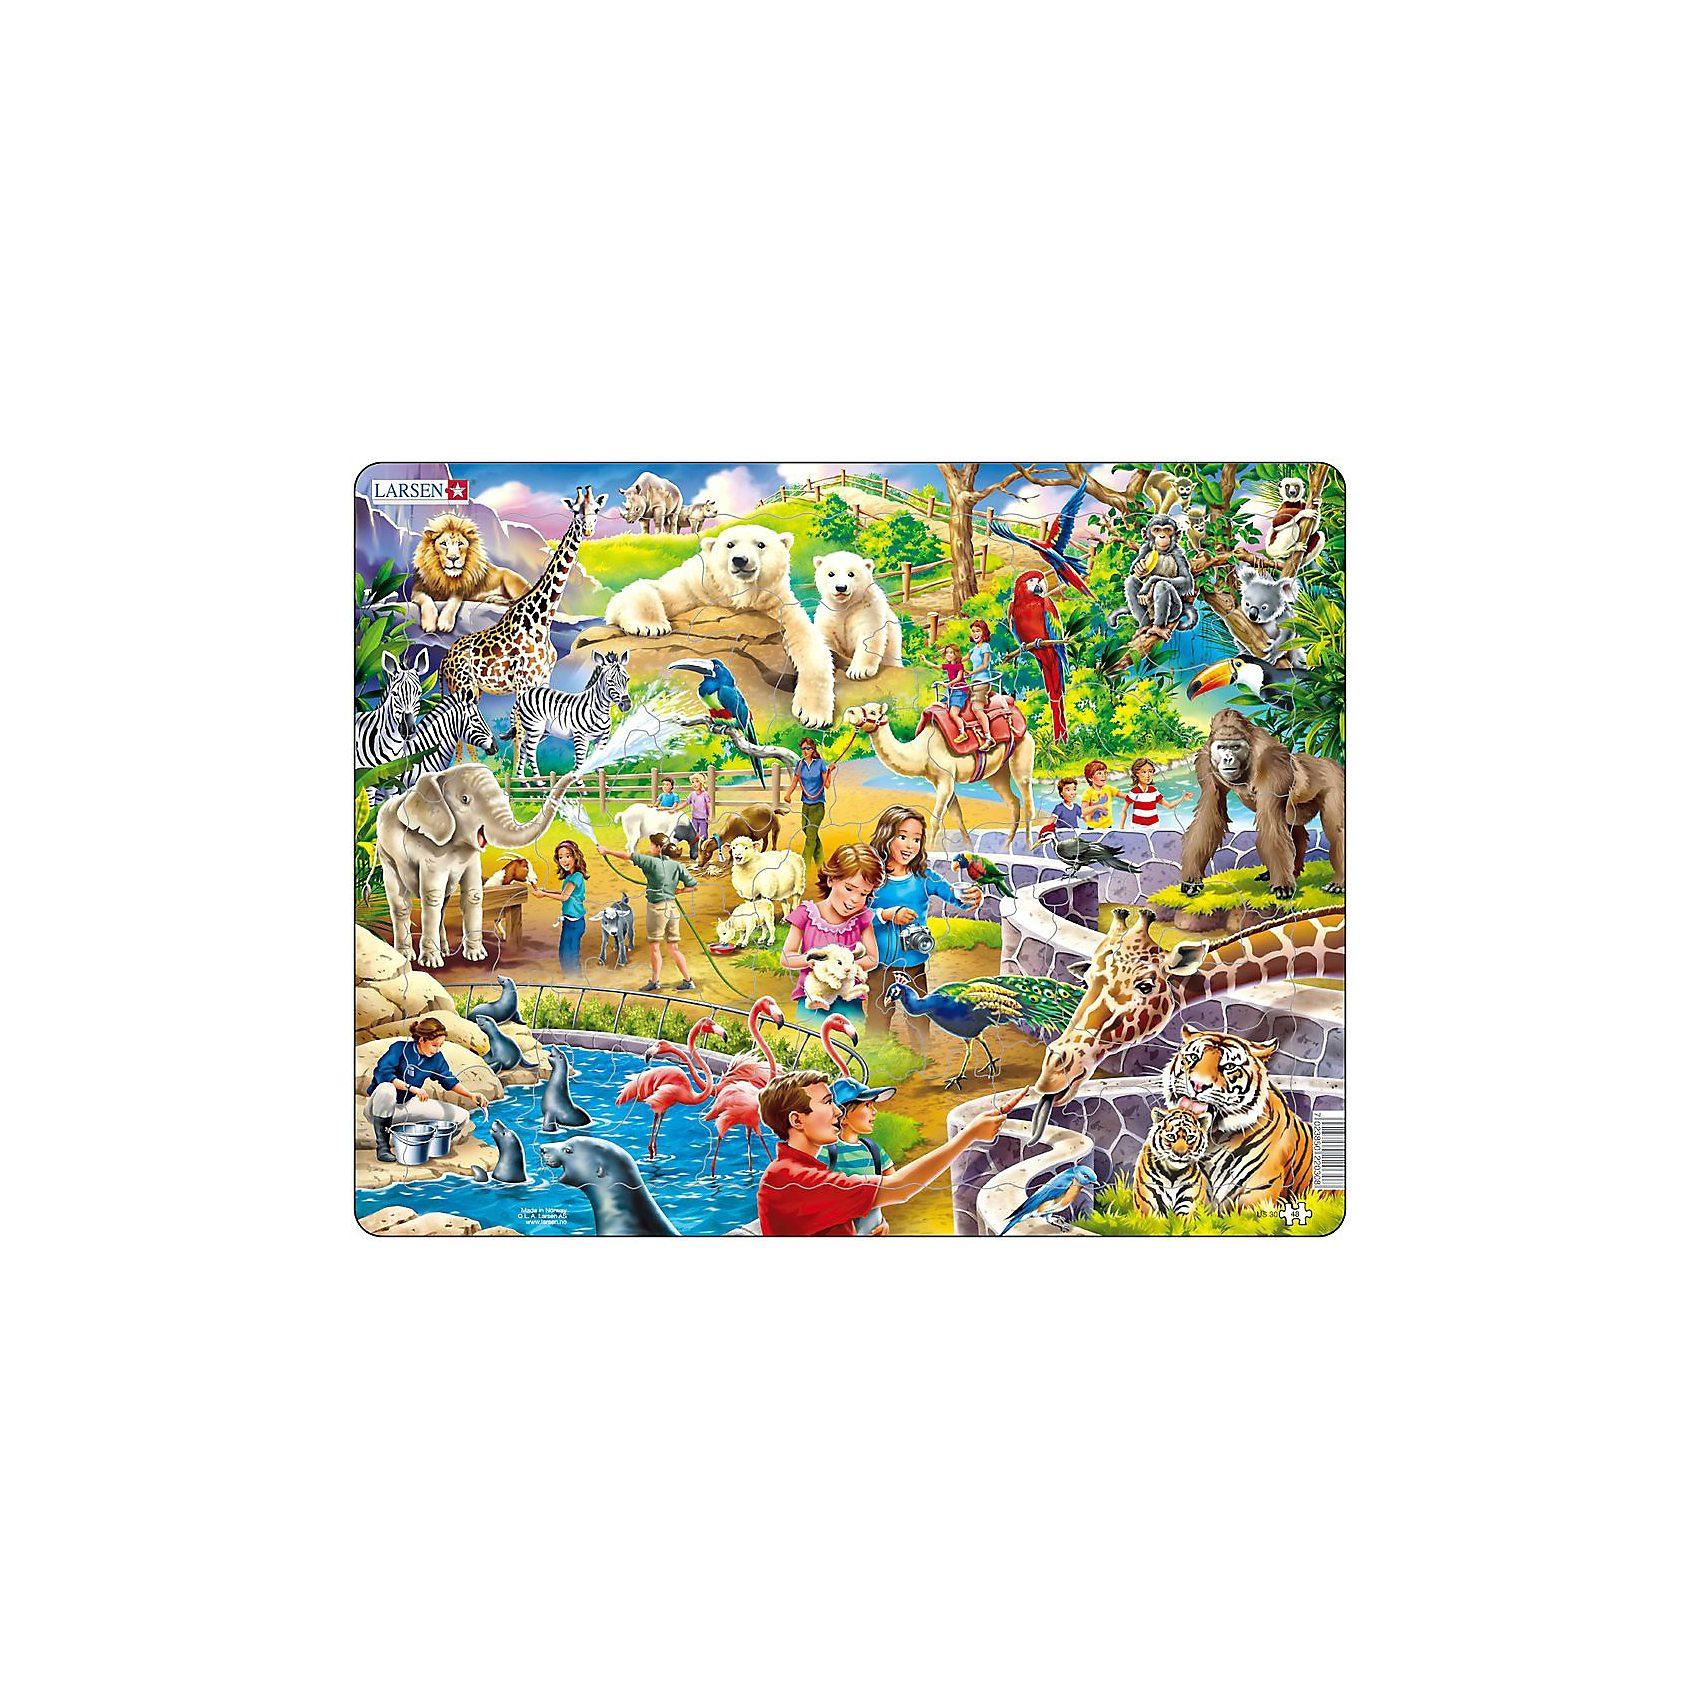 Larsen Rahmenpuzzle 48 Teile Zoo